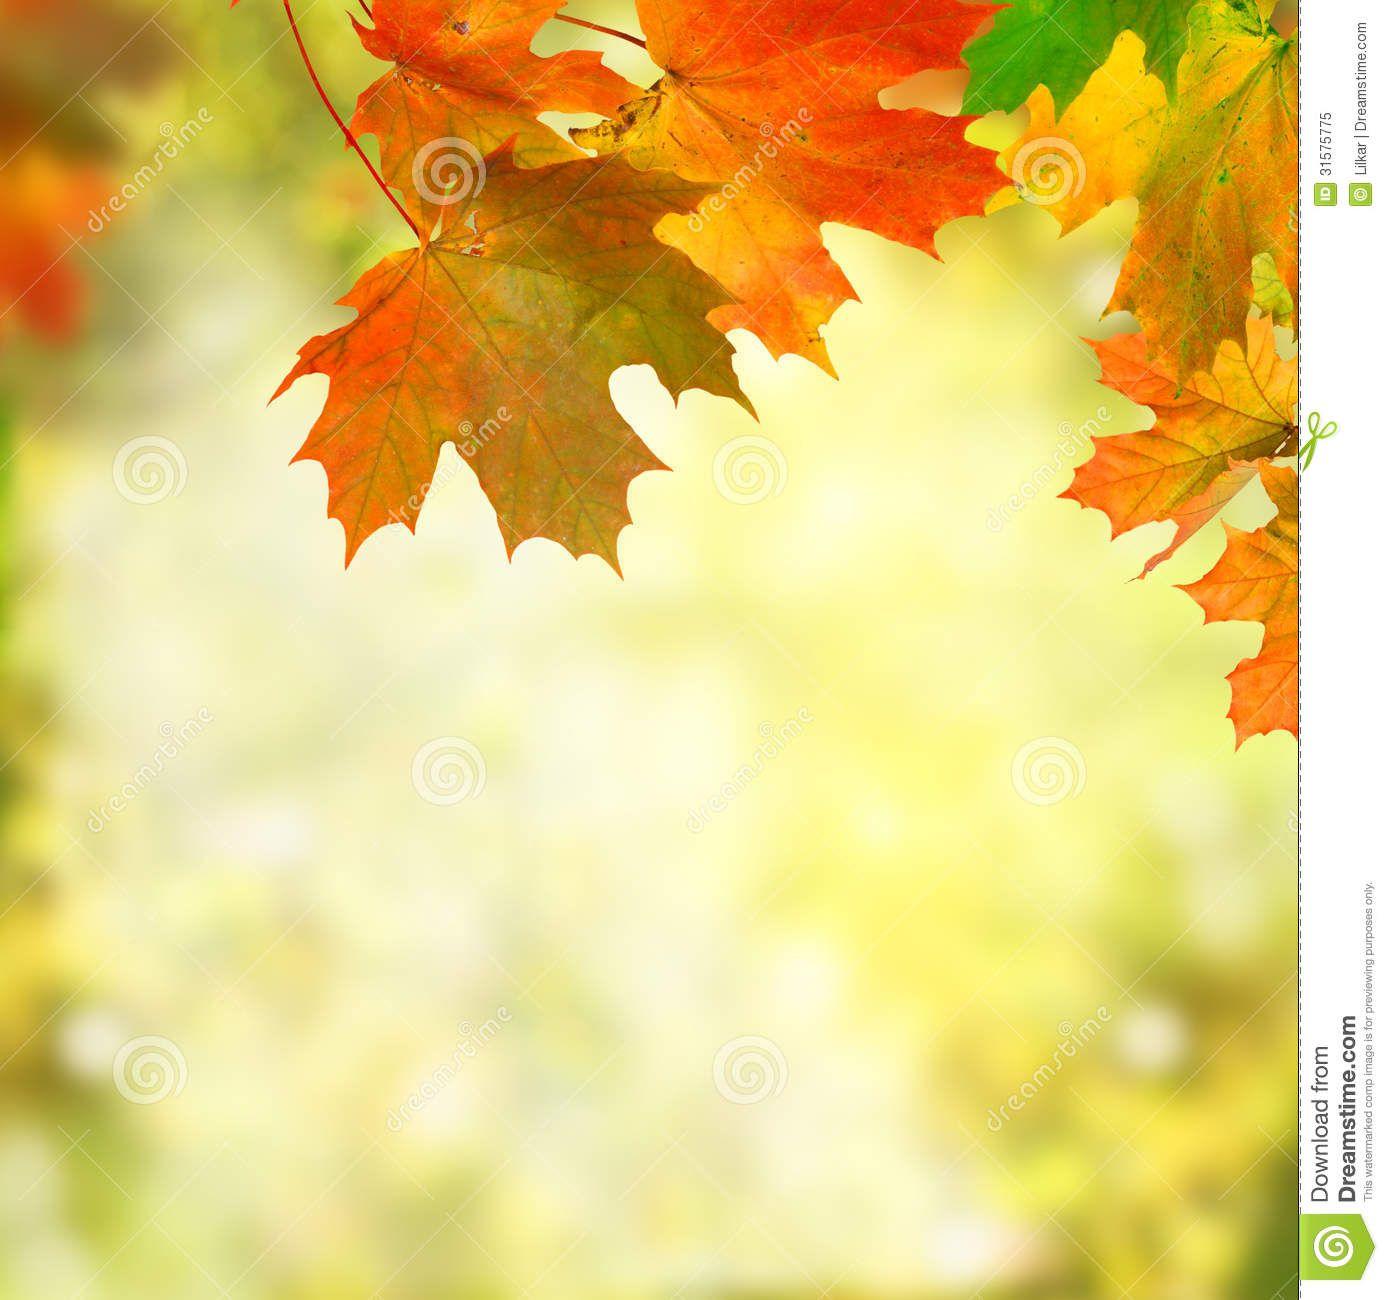 Fall Pics Wallpaper: Pin By HD Wallpapers On Hd Wallpaper Full